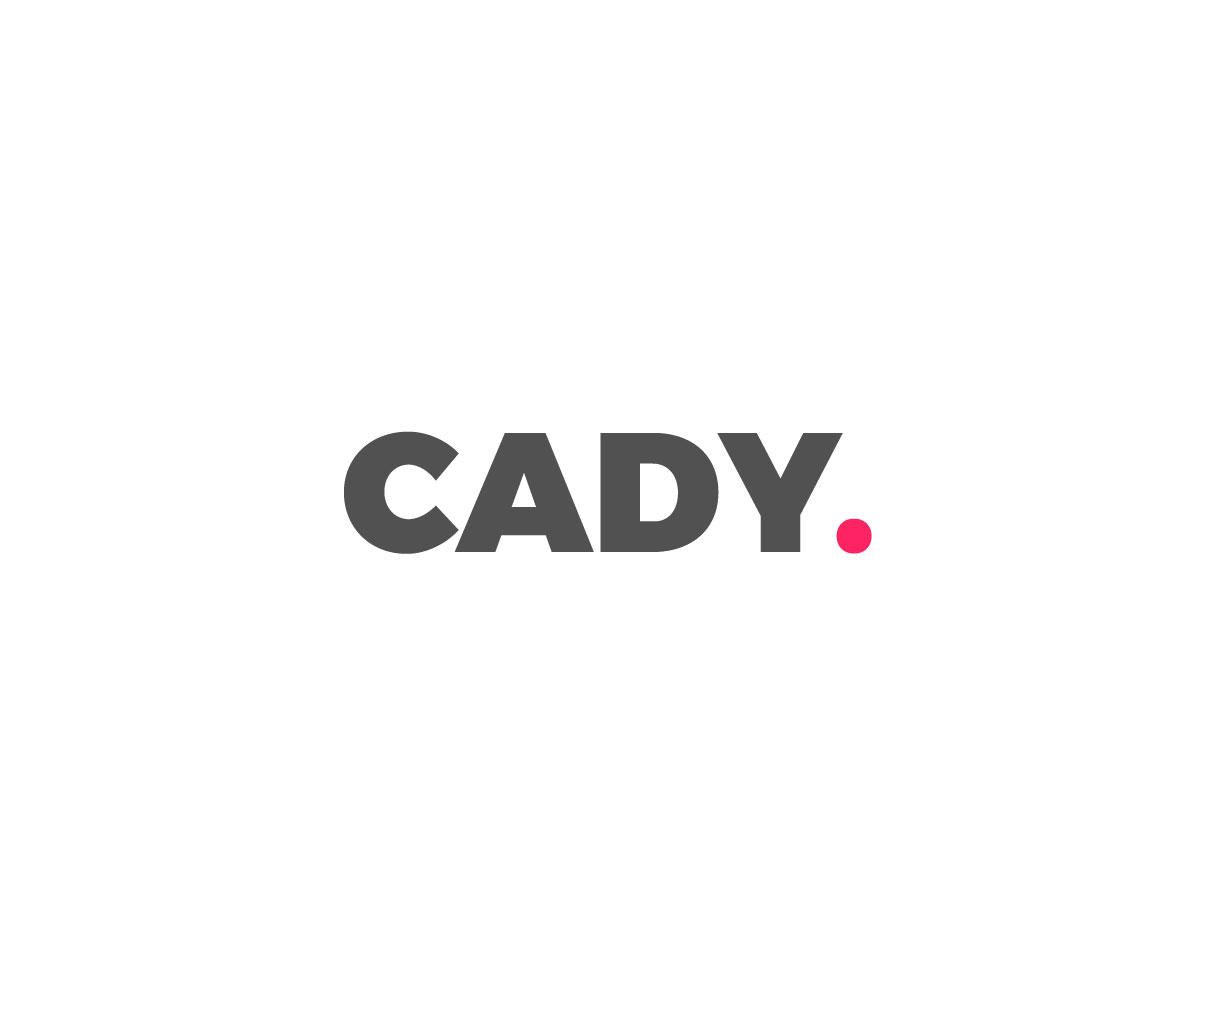 cady.jpg